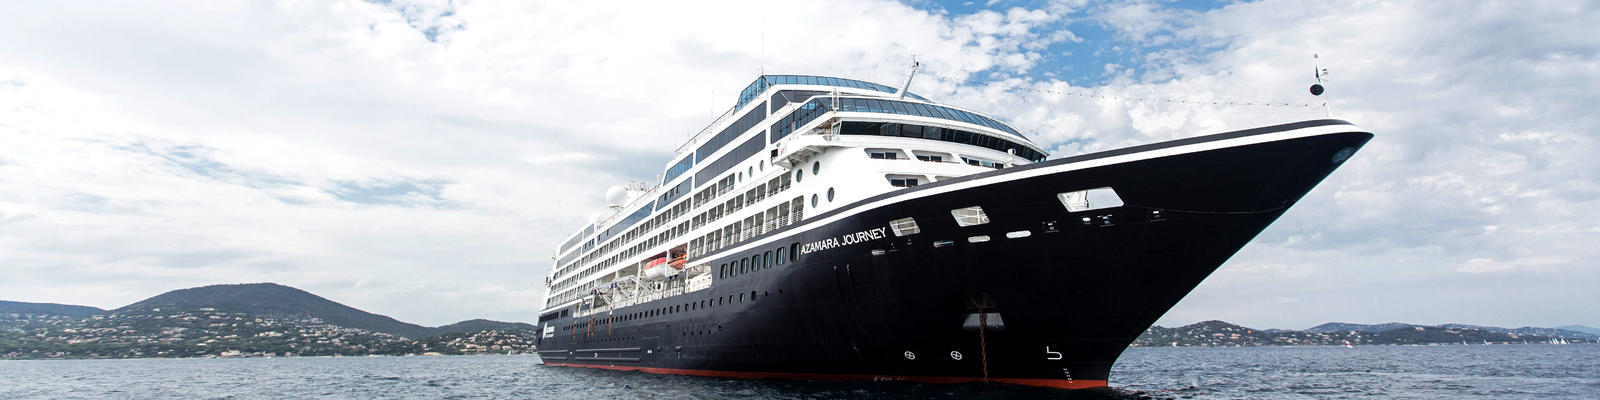 Azamara Journey (Photo: Cruise Critic)